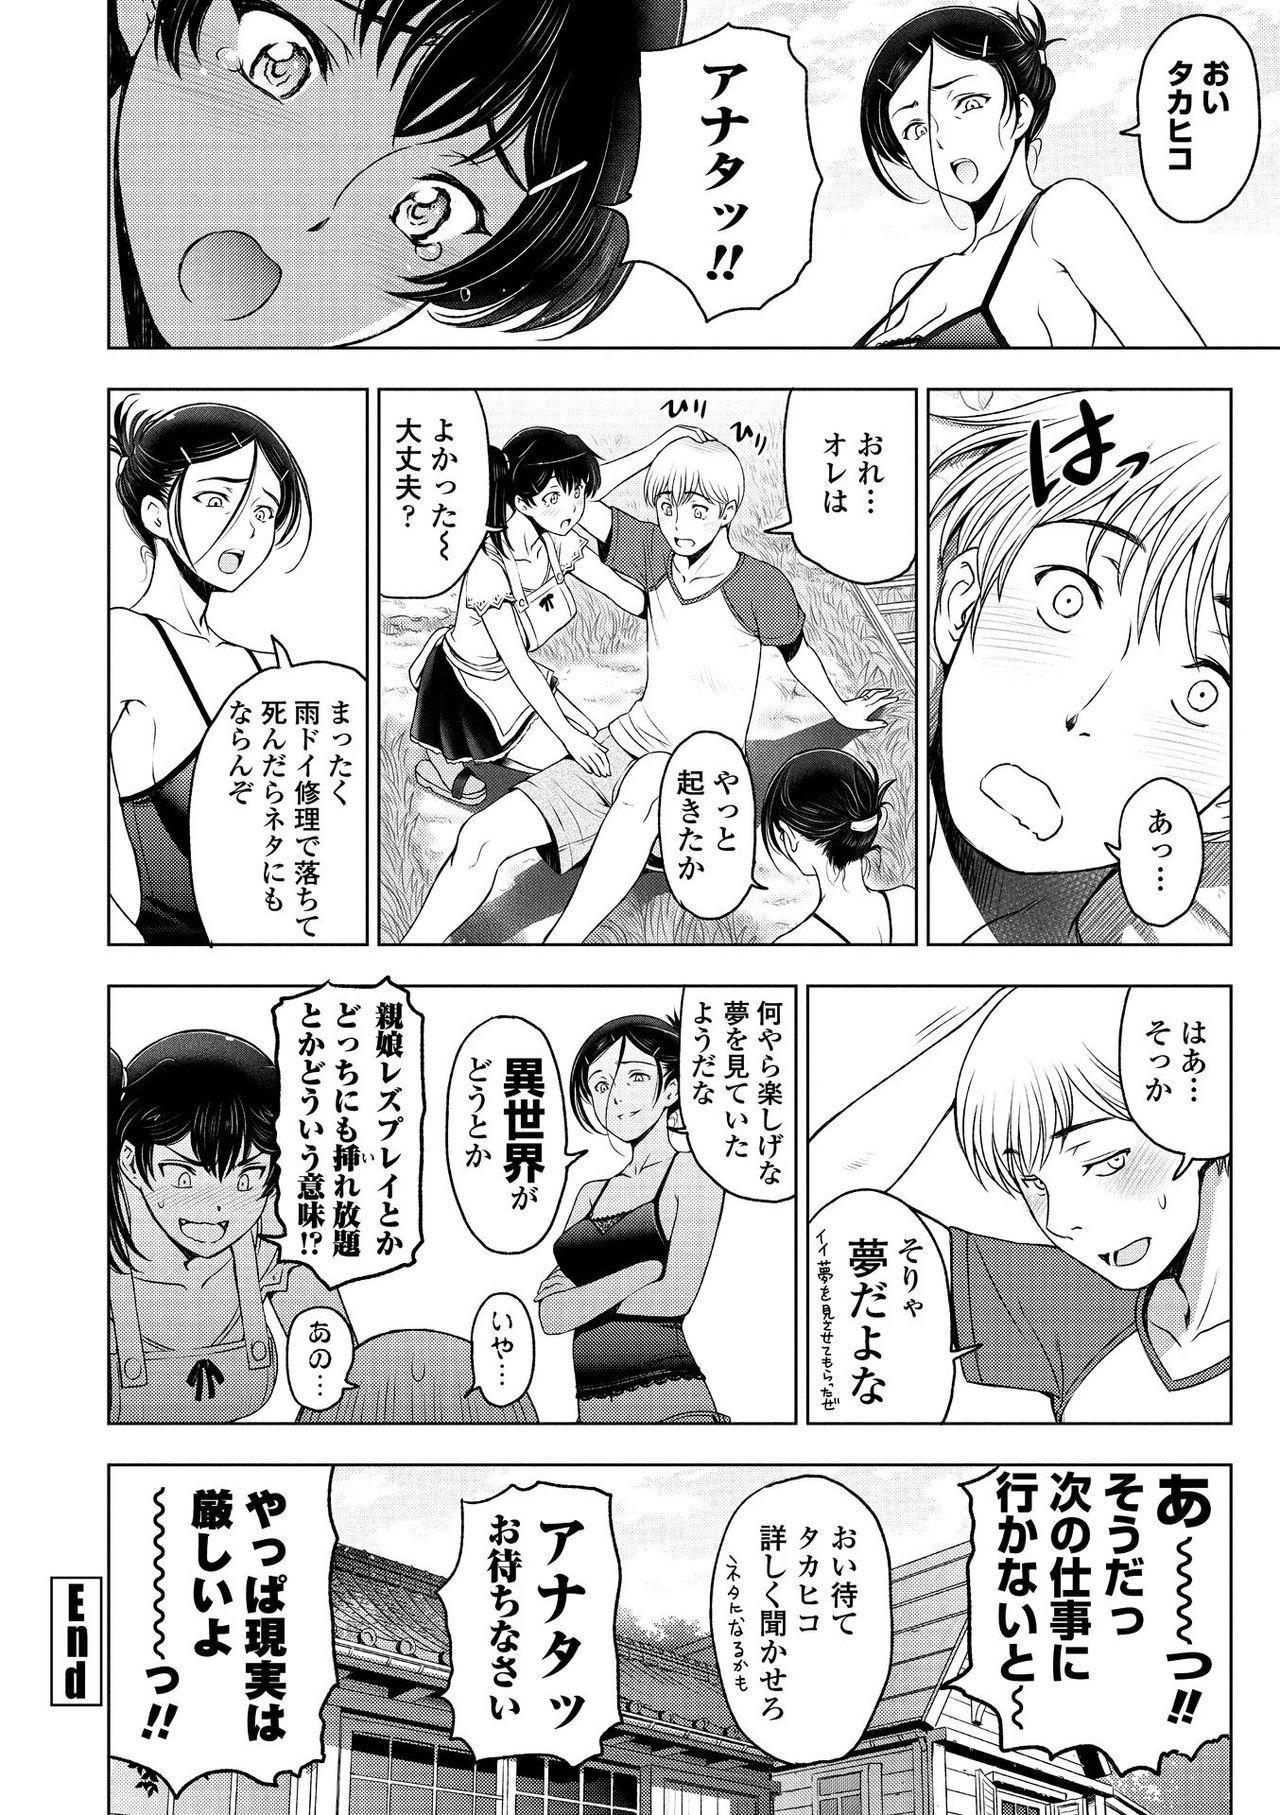 Dosukebe Onei-chan 225